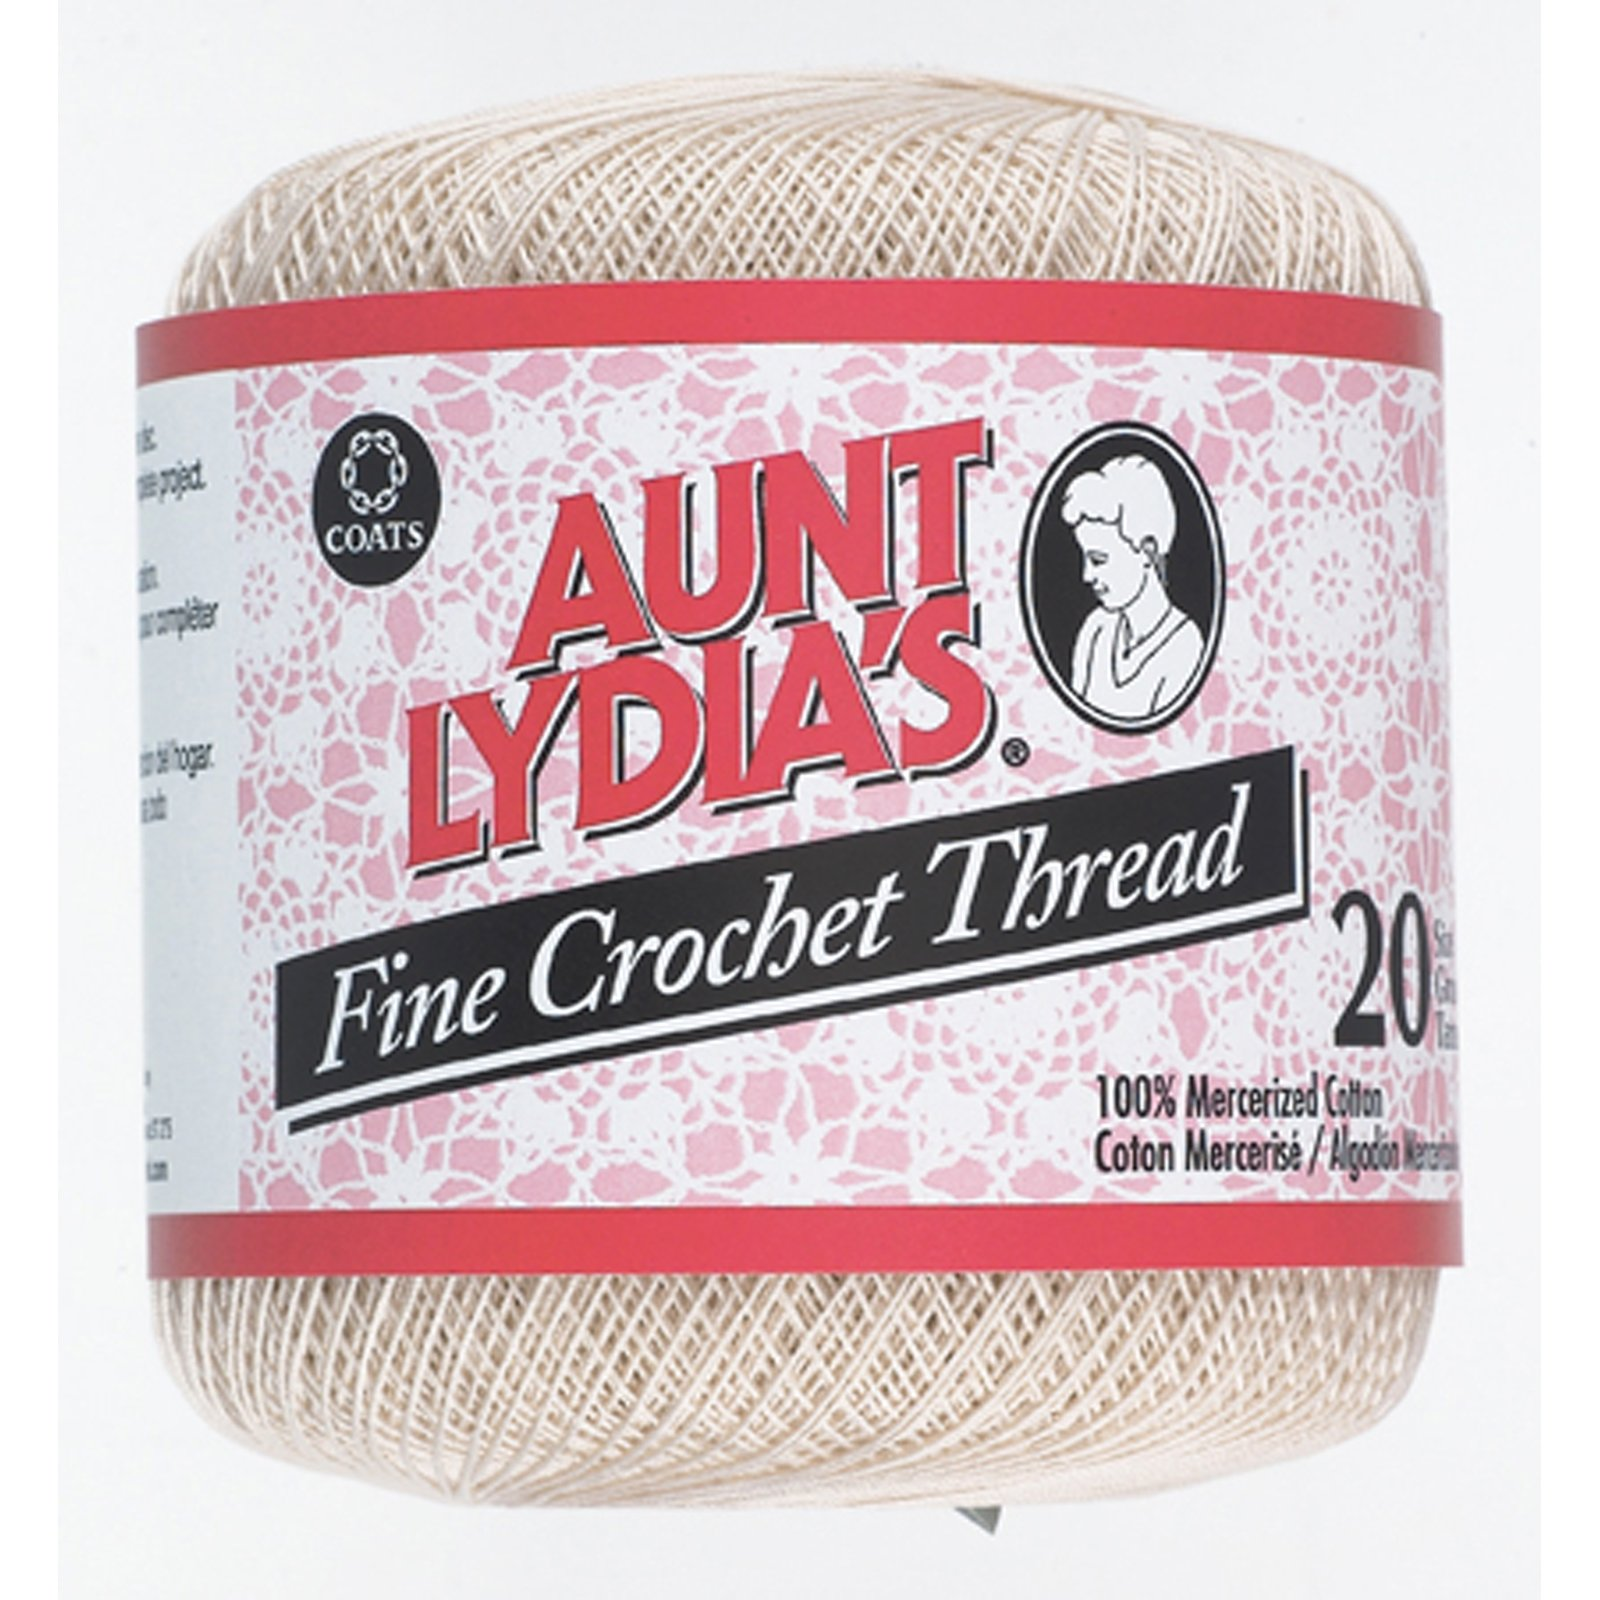 Aunt Lydia'S Fine Crochet Thread, Natural, 400 Yds - 3 Pkgs by Aunt Lydia's (Image #1)